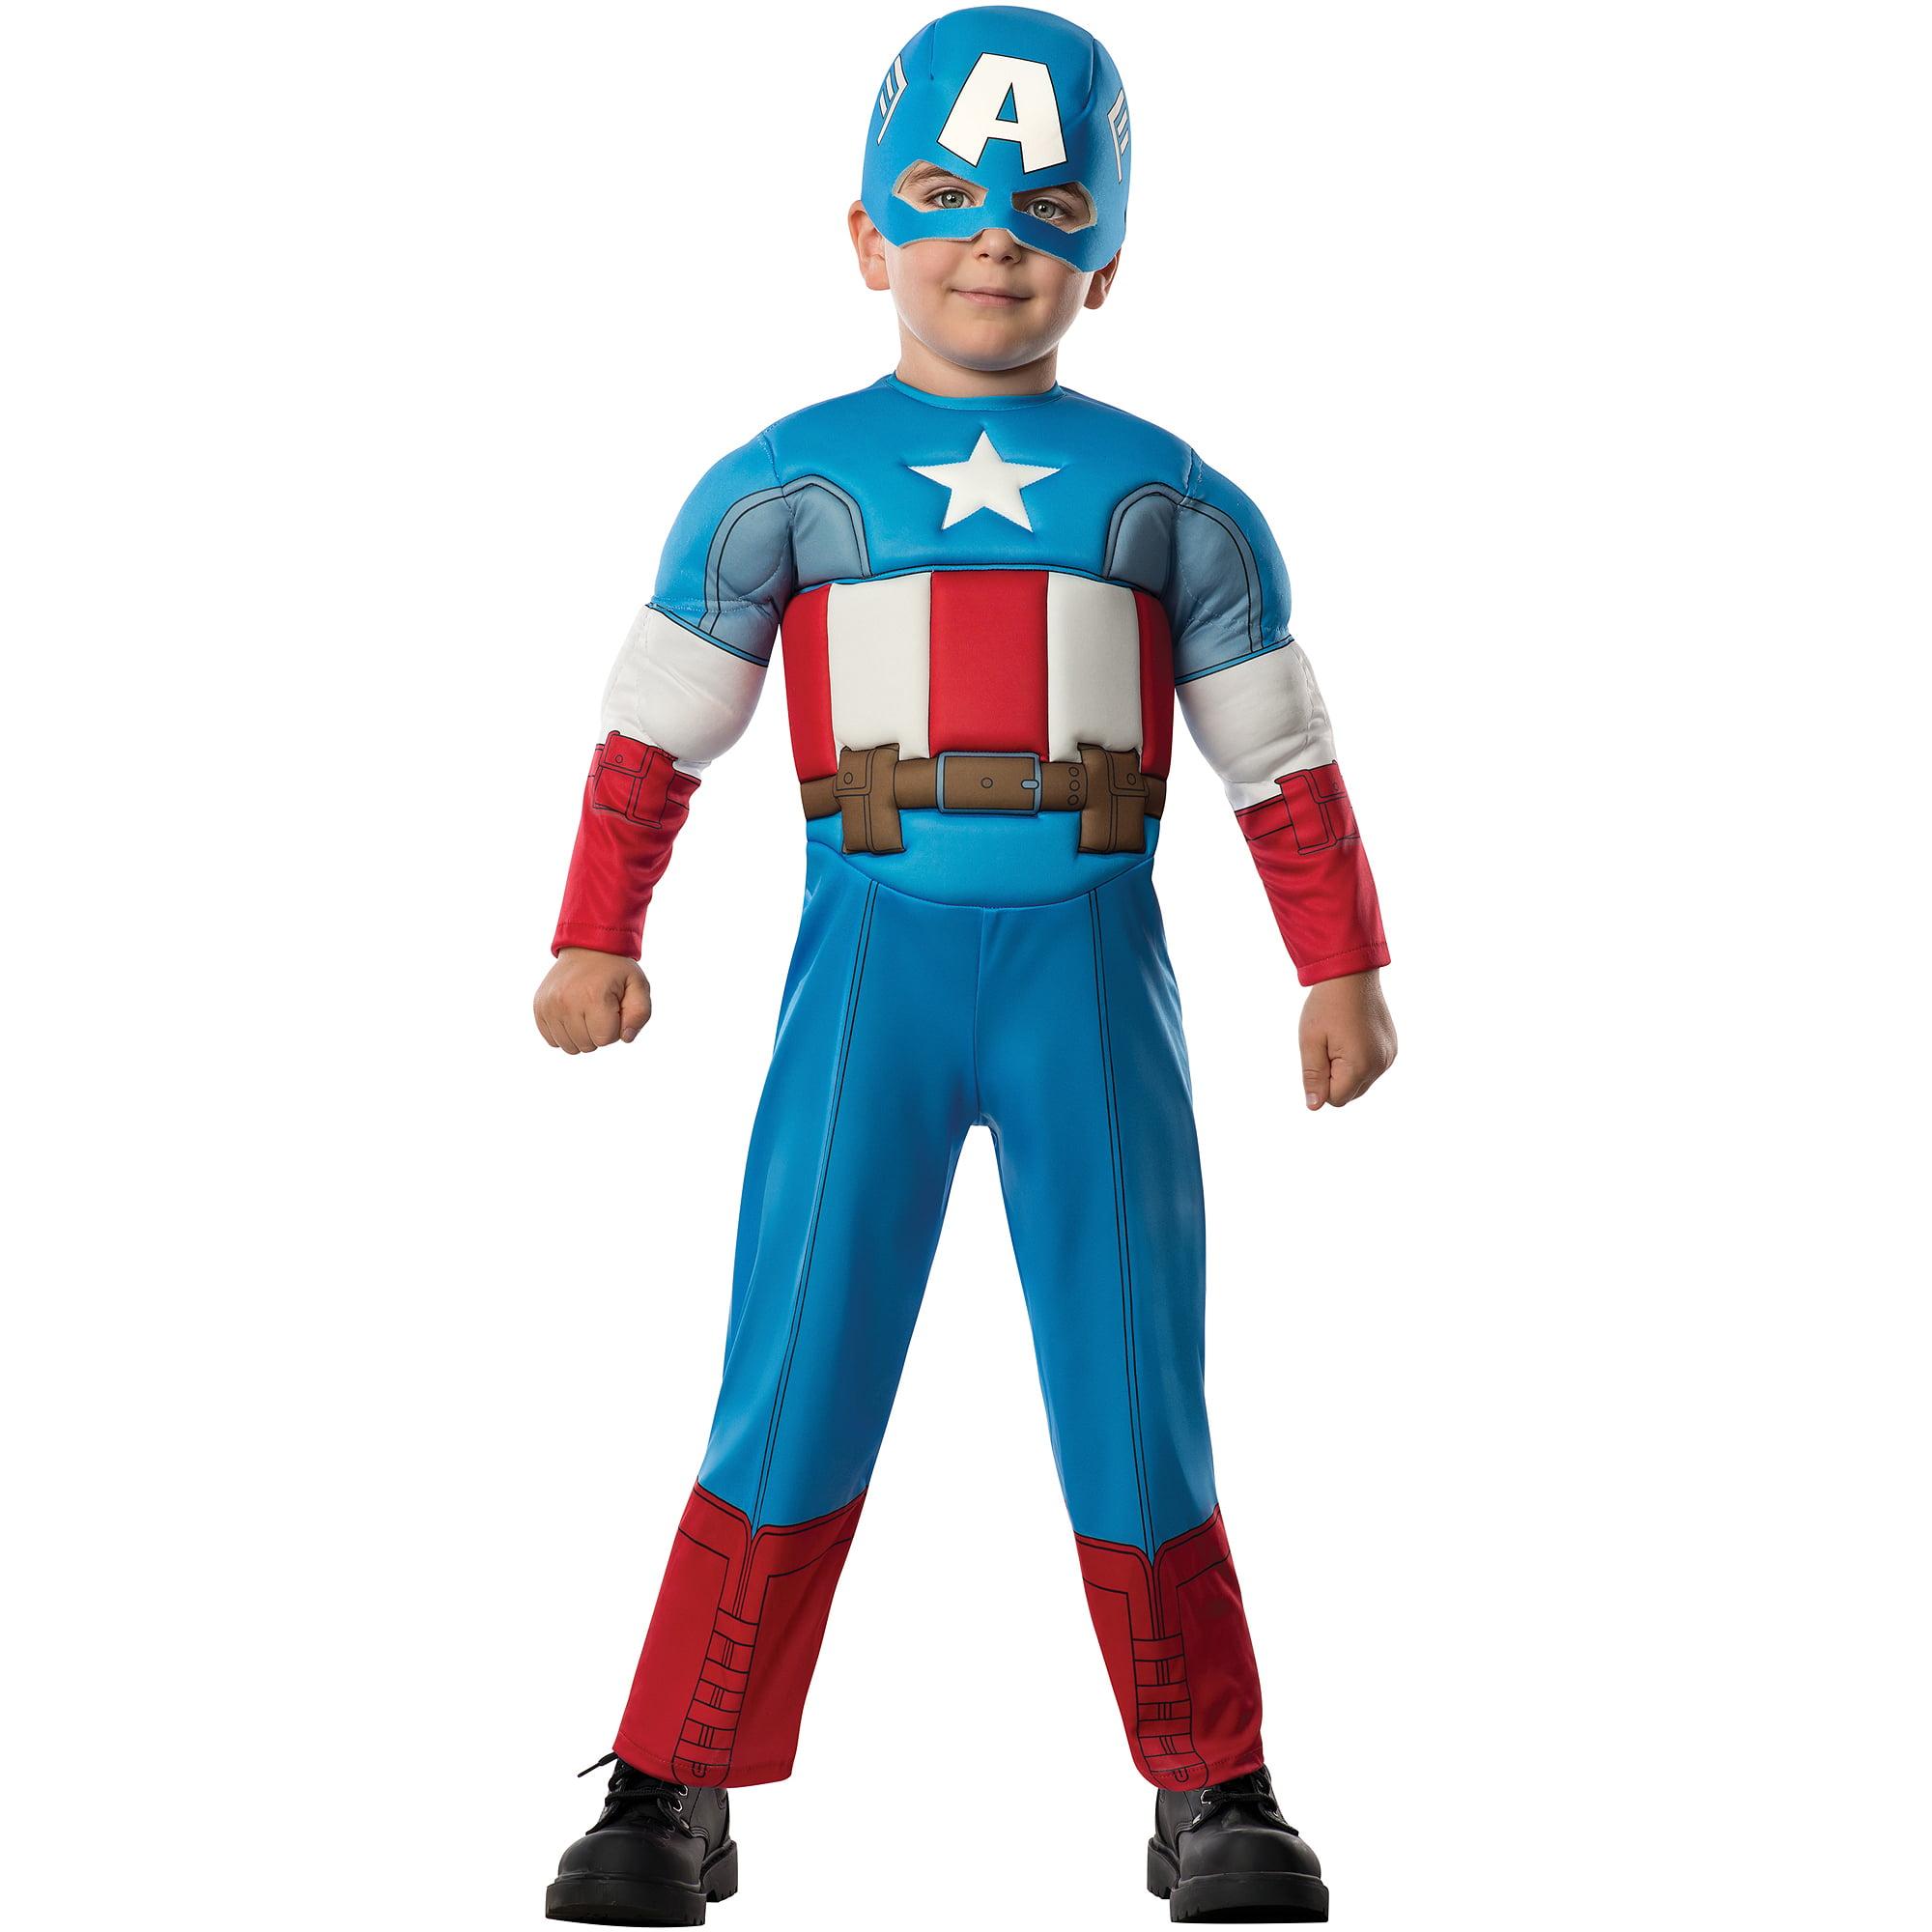 sc 1 st  Walmart.com & Avengers Captain America Toddler Halloween Costume - Walmart.com